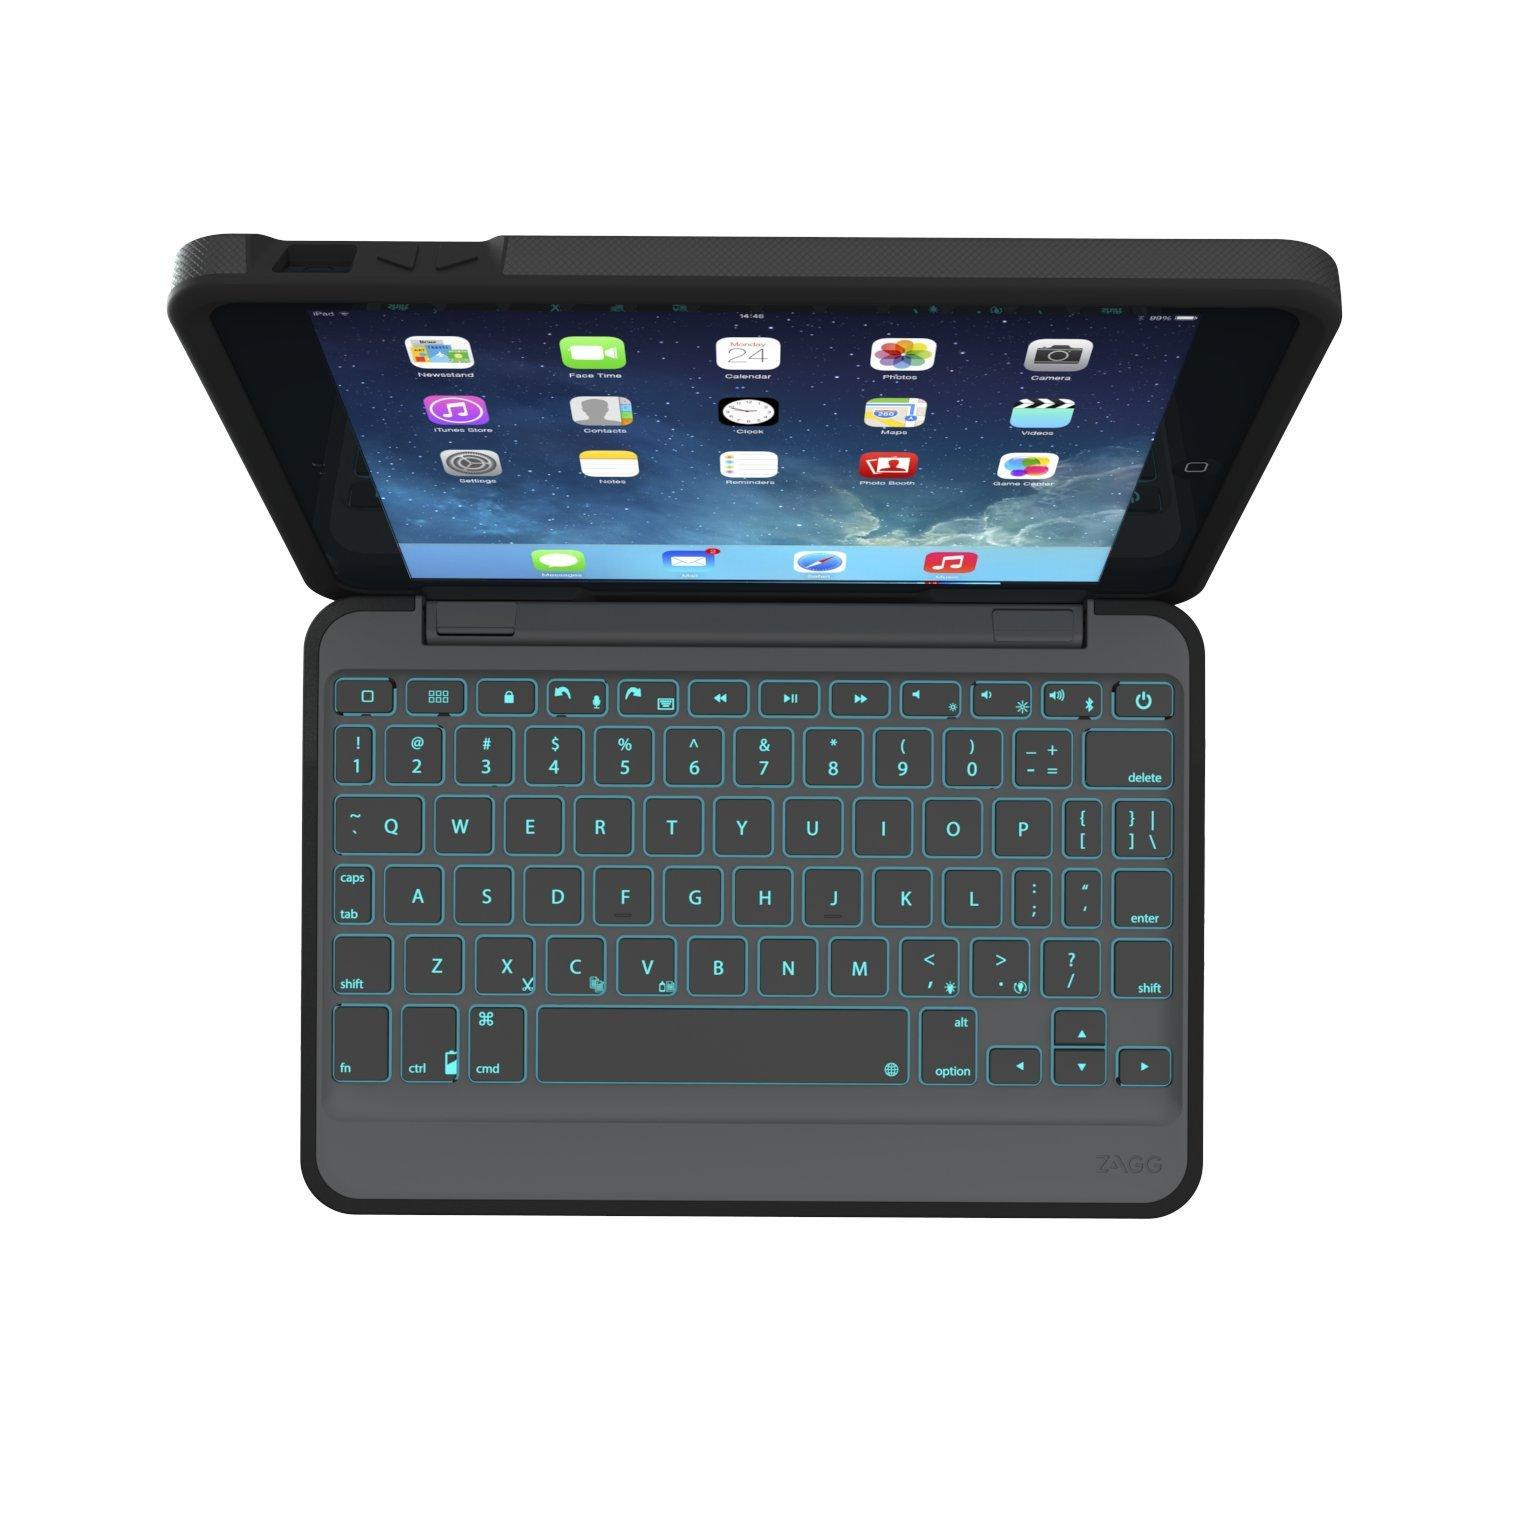 ZAGG Rugged Book Durable Case, Hinged with Detachable Backlit Keyboard for iPad Mini/Mini 2/ Mini 3 - Black